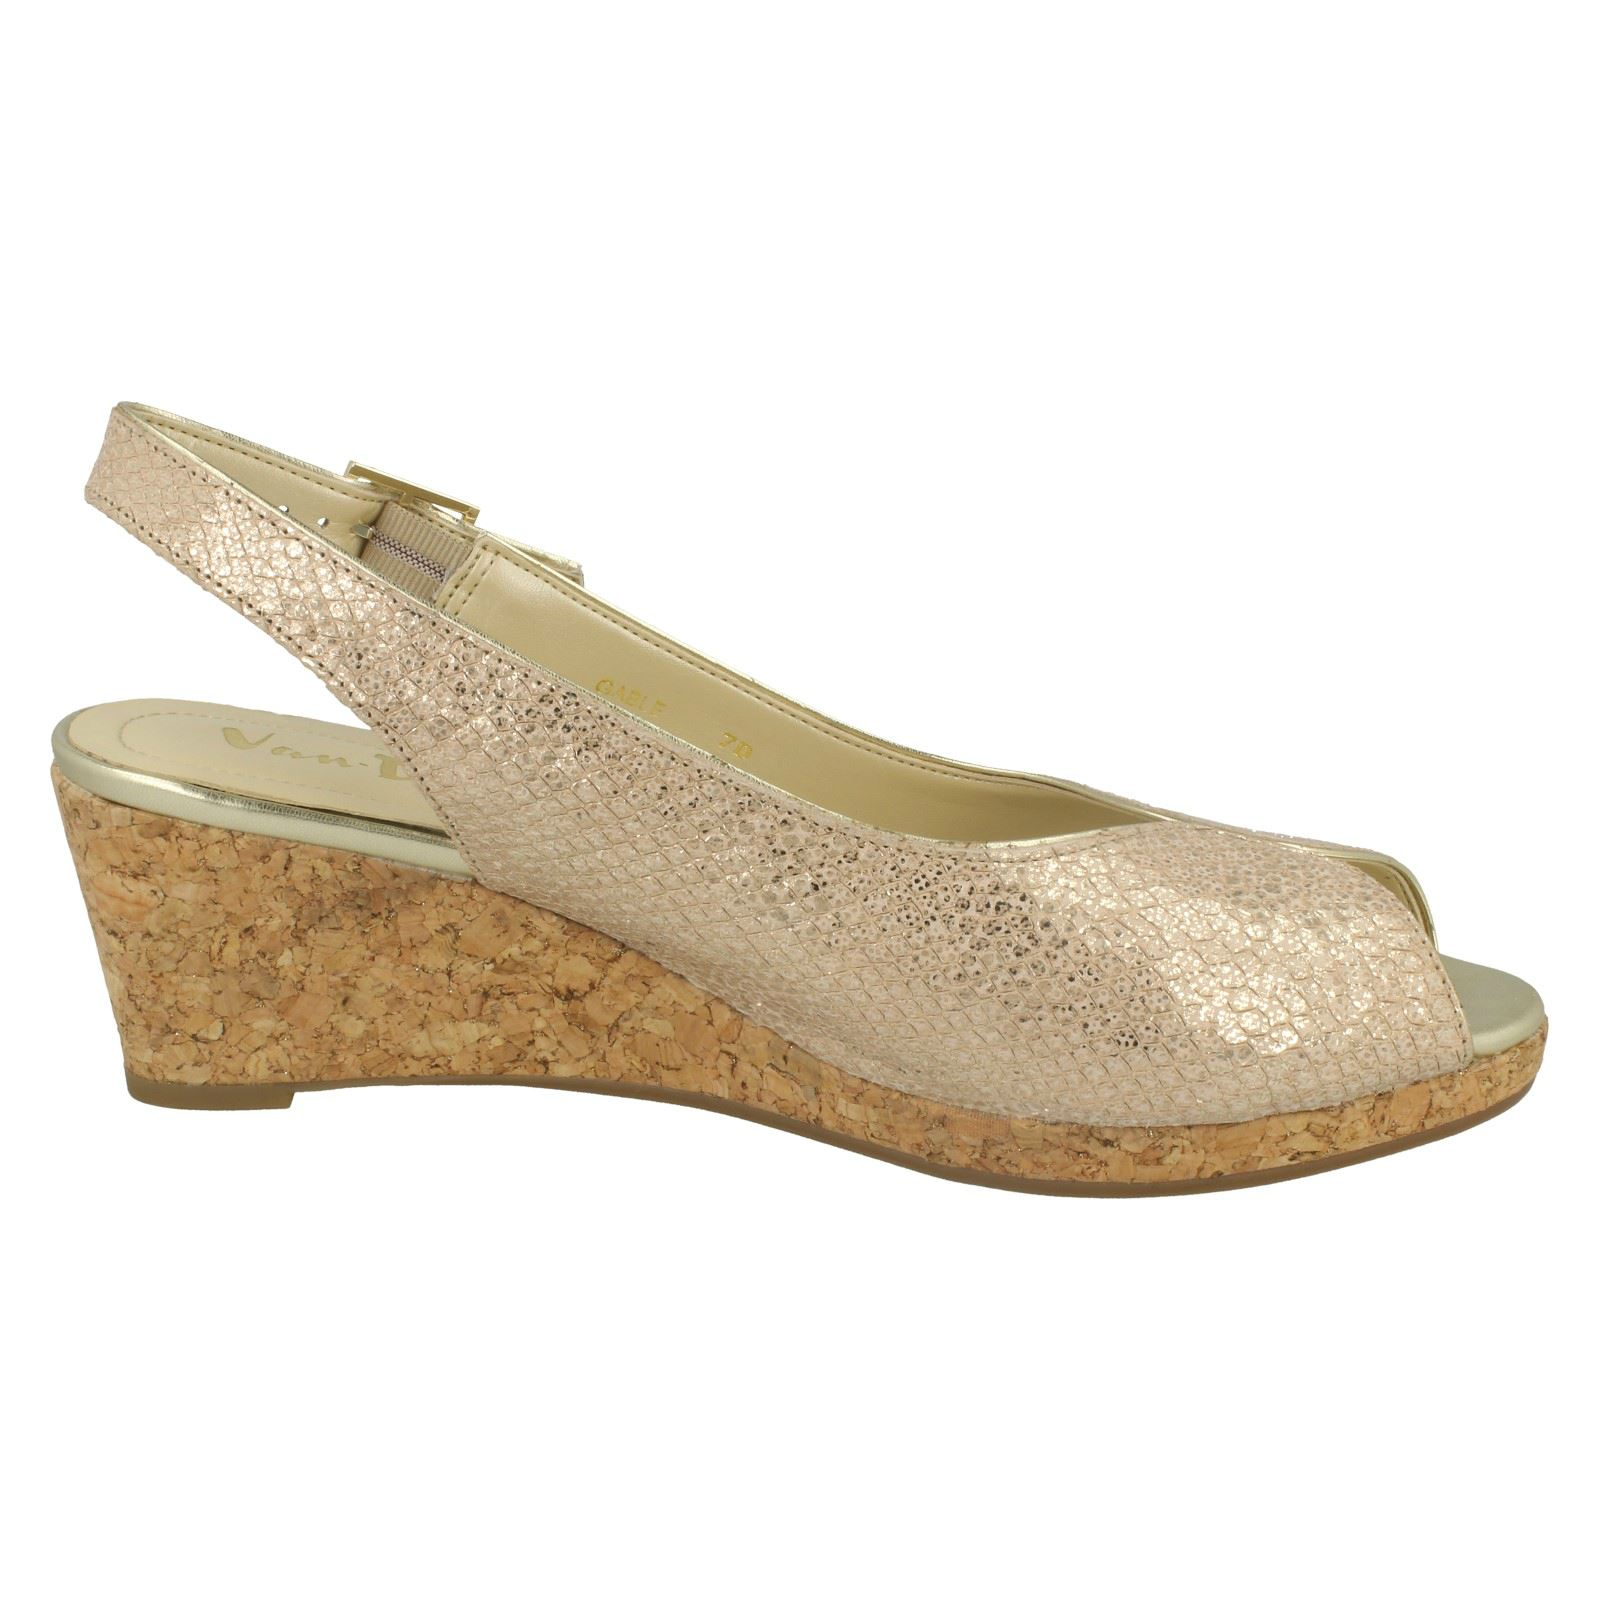 Ladies-Van-Dal-Cork-Wedge-Sandals-039-Gable-039 thumbnail 6